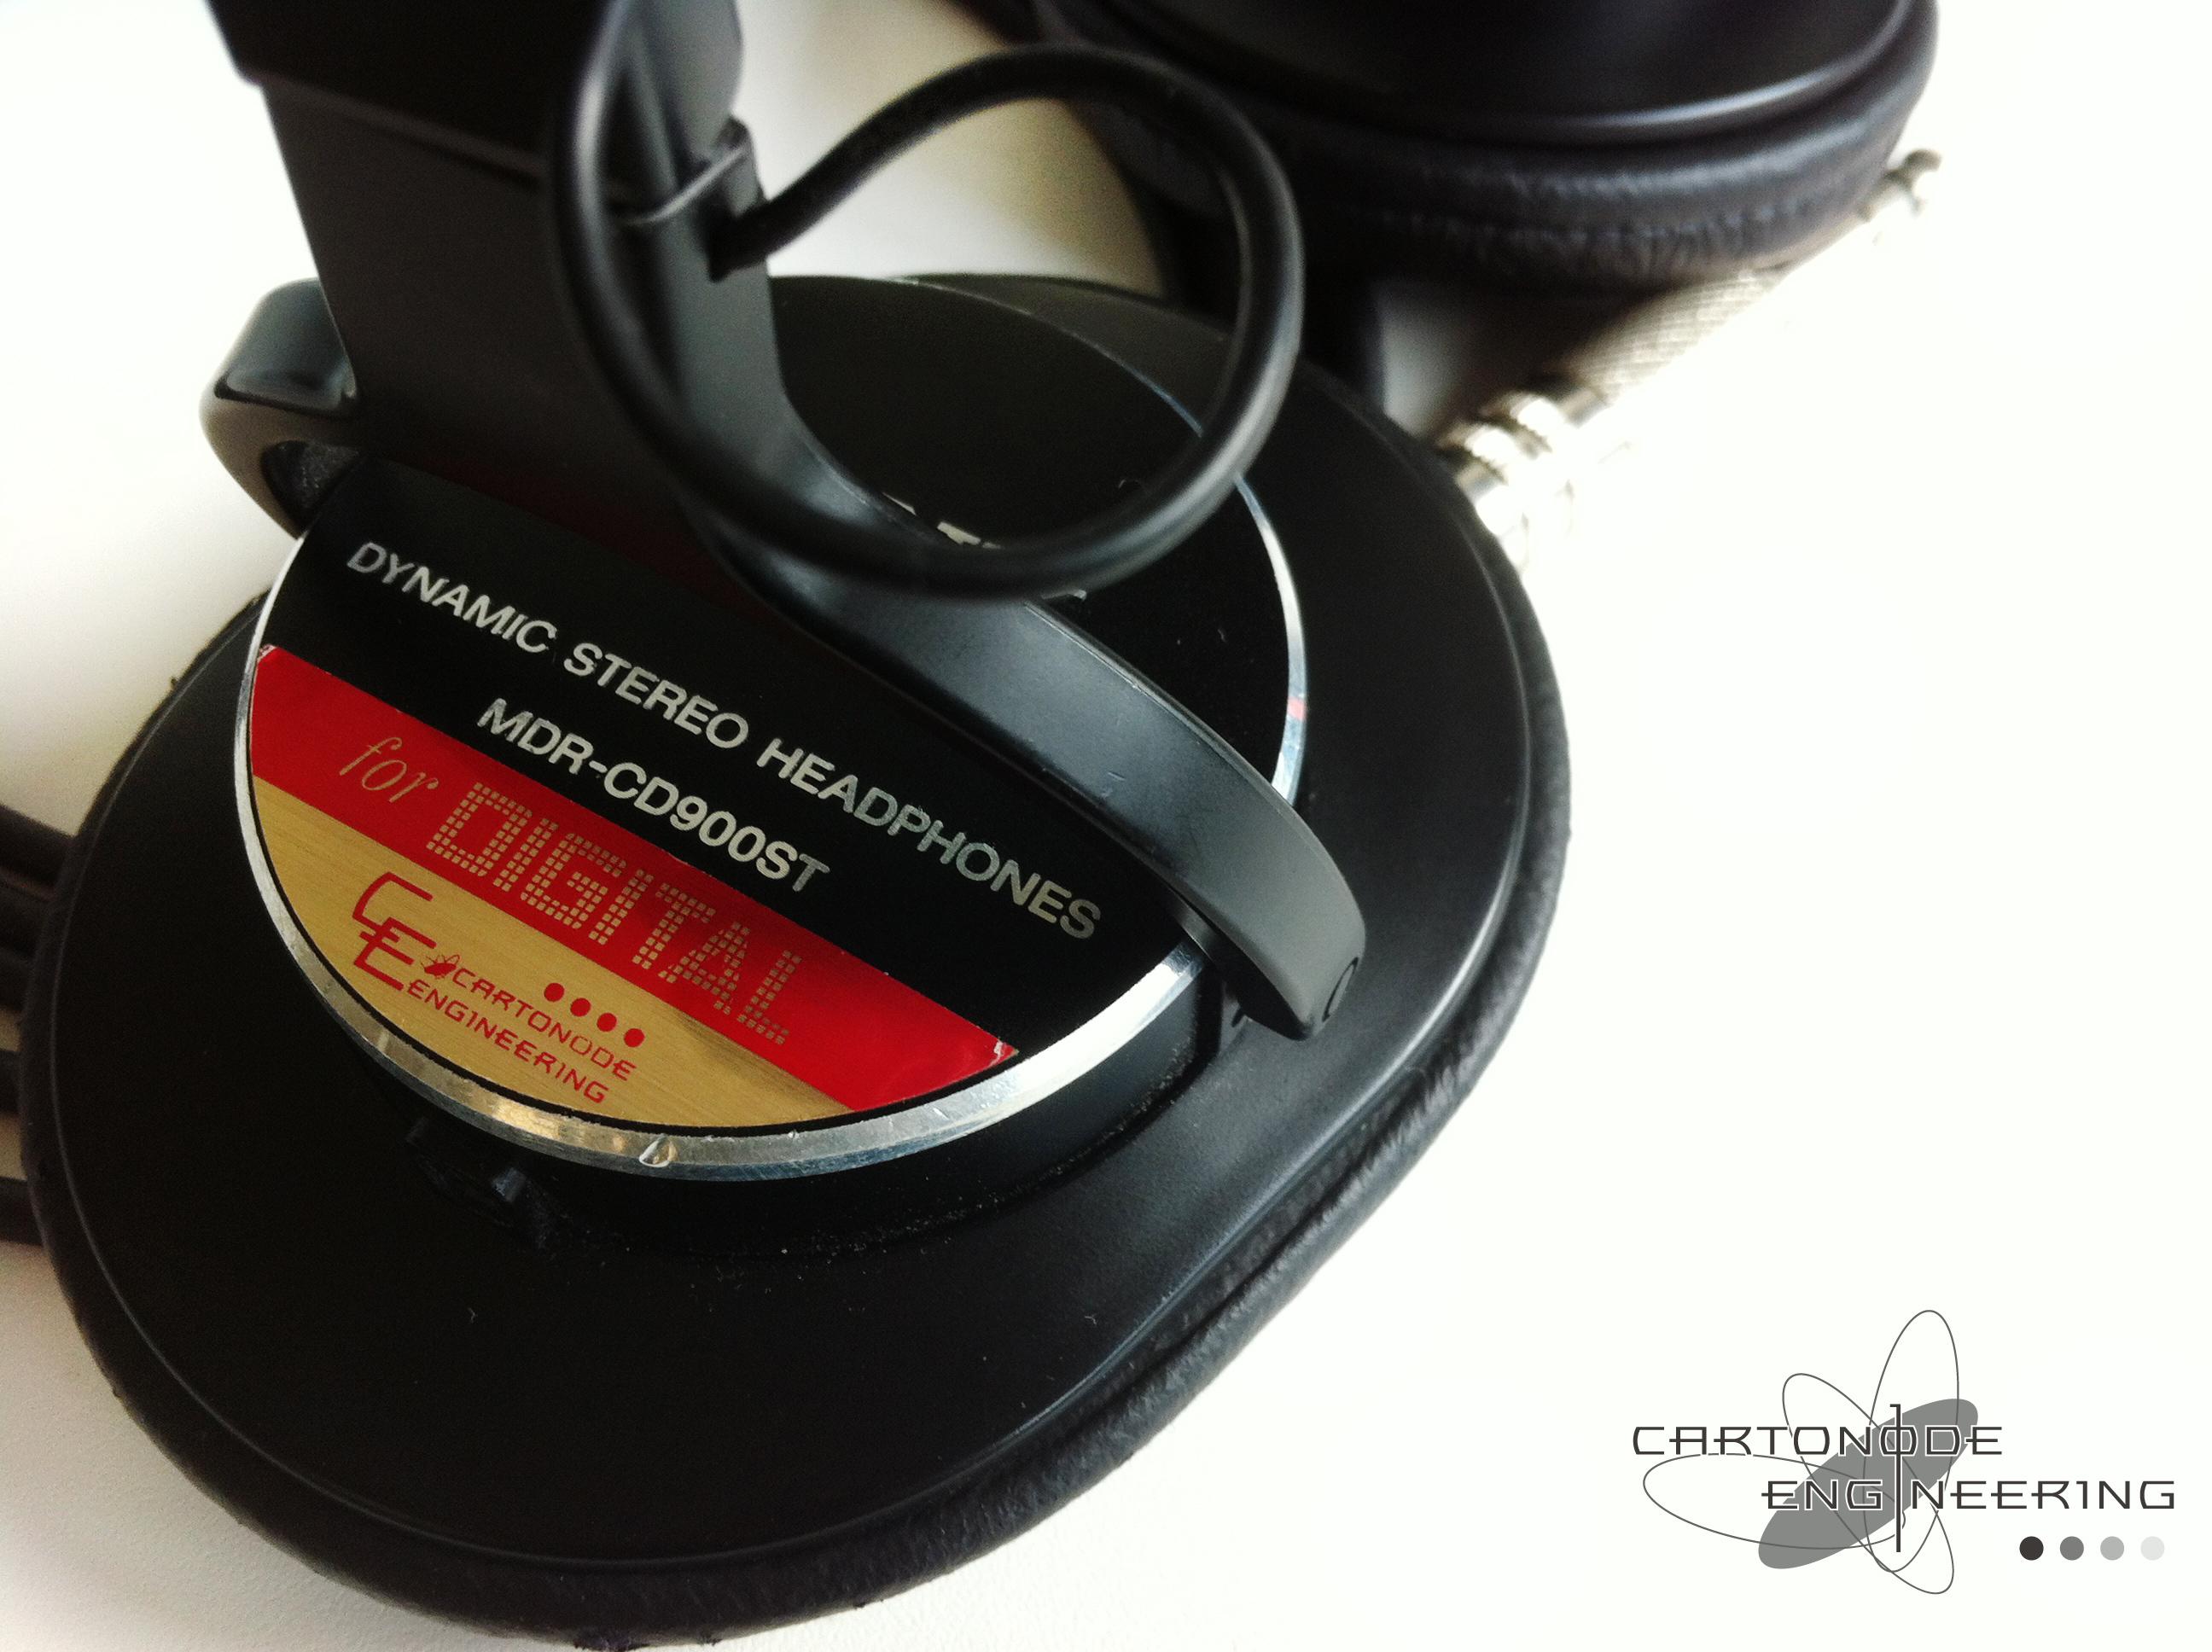 <MDR-CD900ST> ★ケーブル脱着加工/ドライバ交換